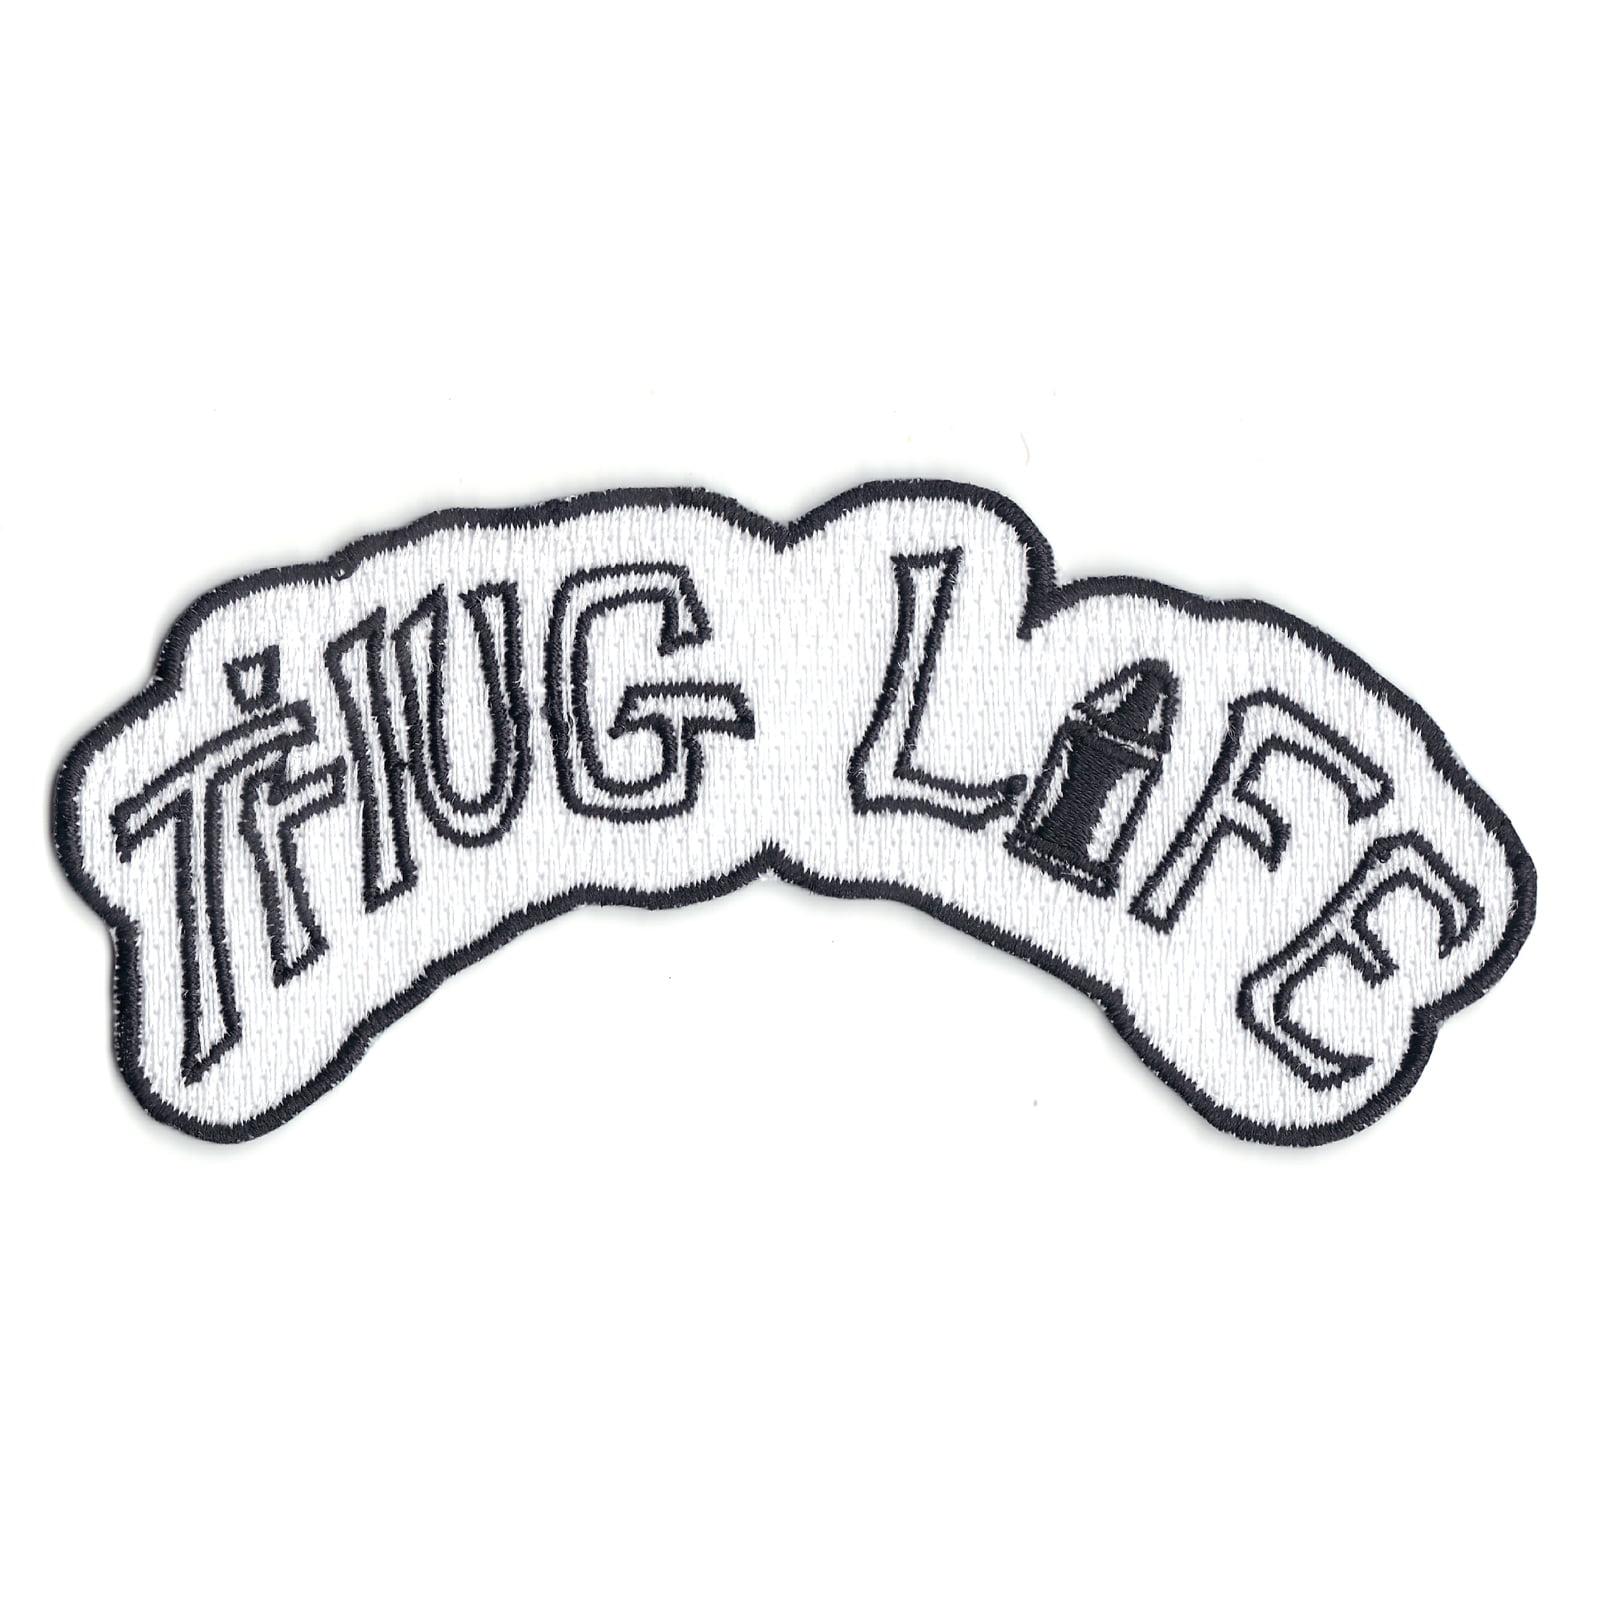 Thug Life Tattoo Iron On Patch